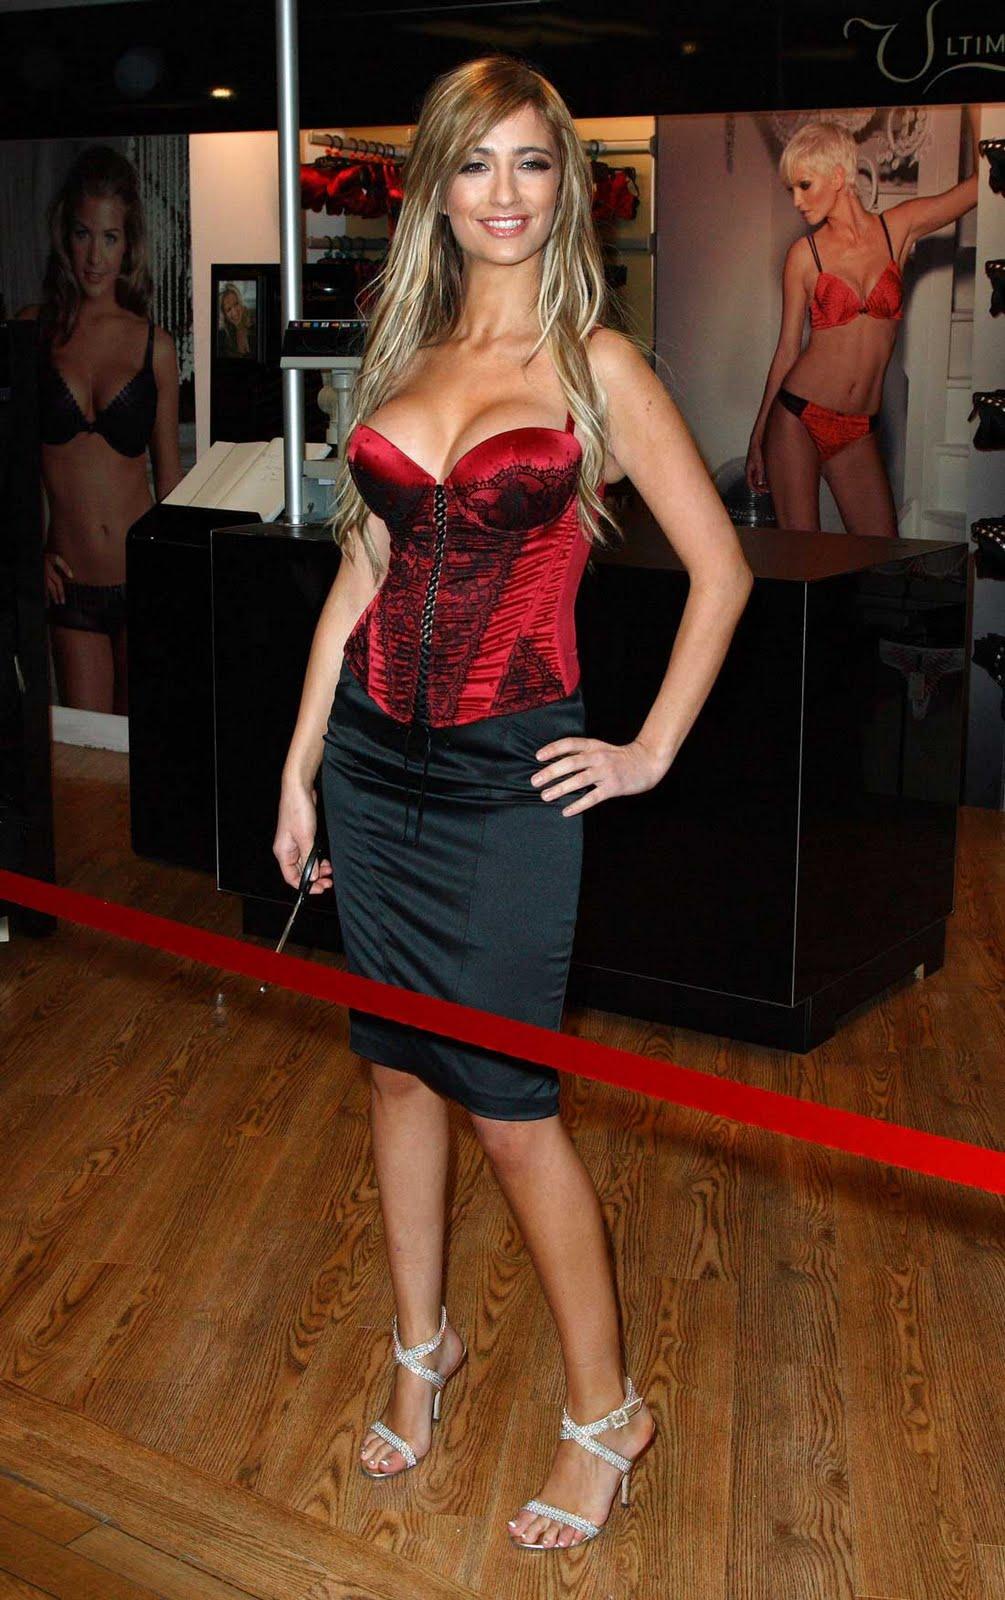 Chantelle morin singles ad Amatuer nude web cams,